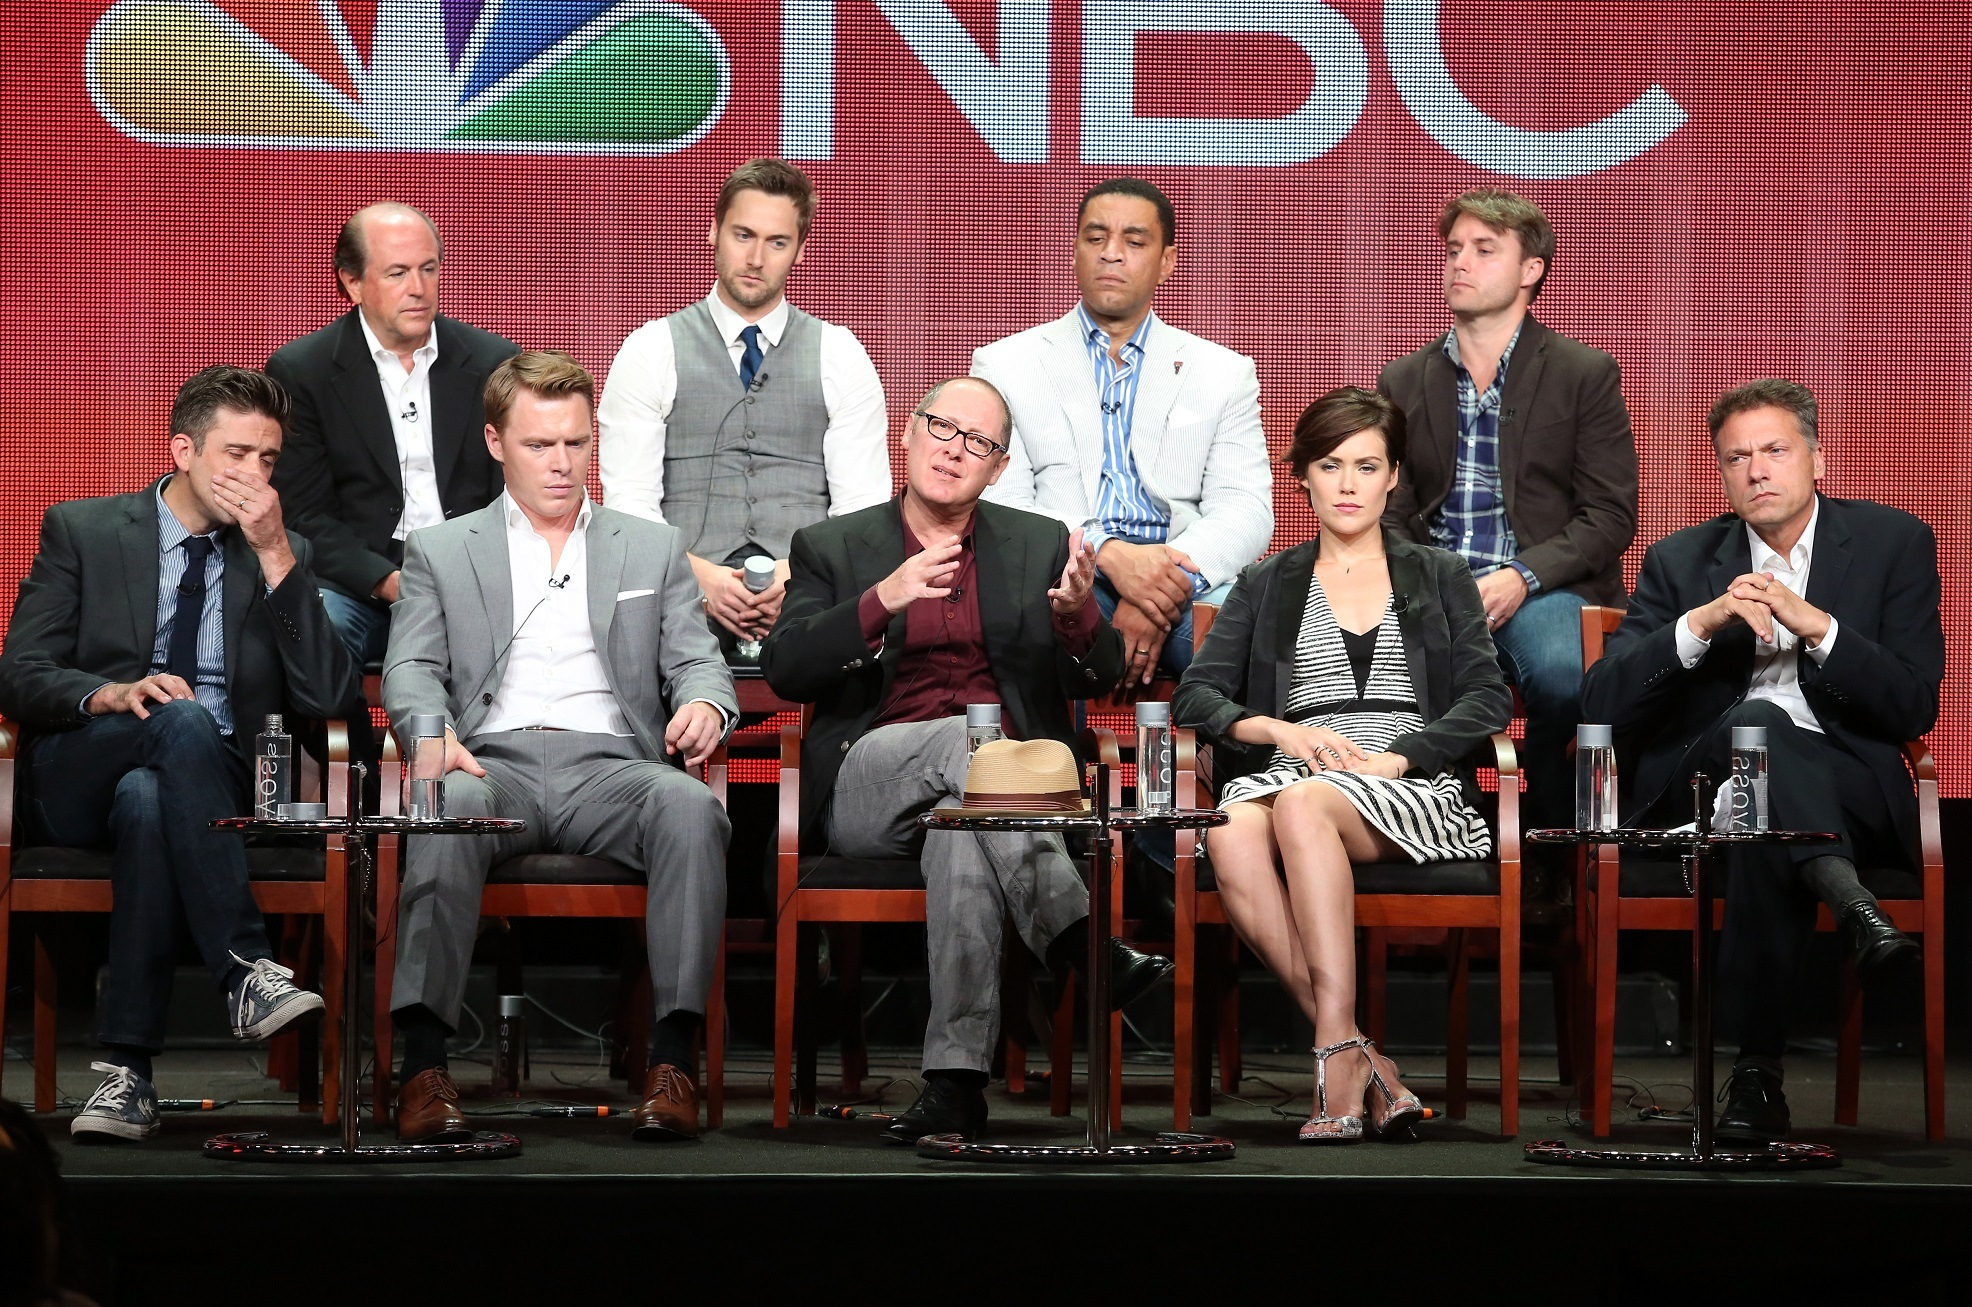 The cast of NBC drama The Blacklist.